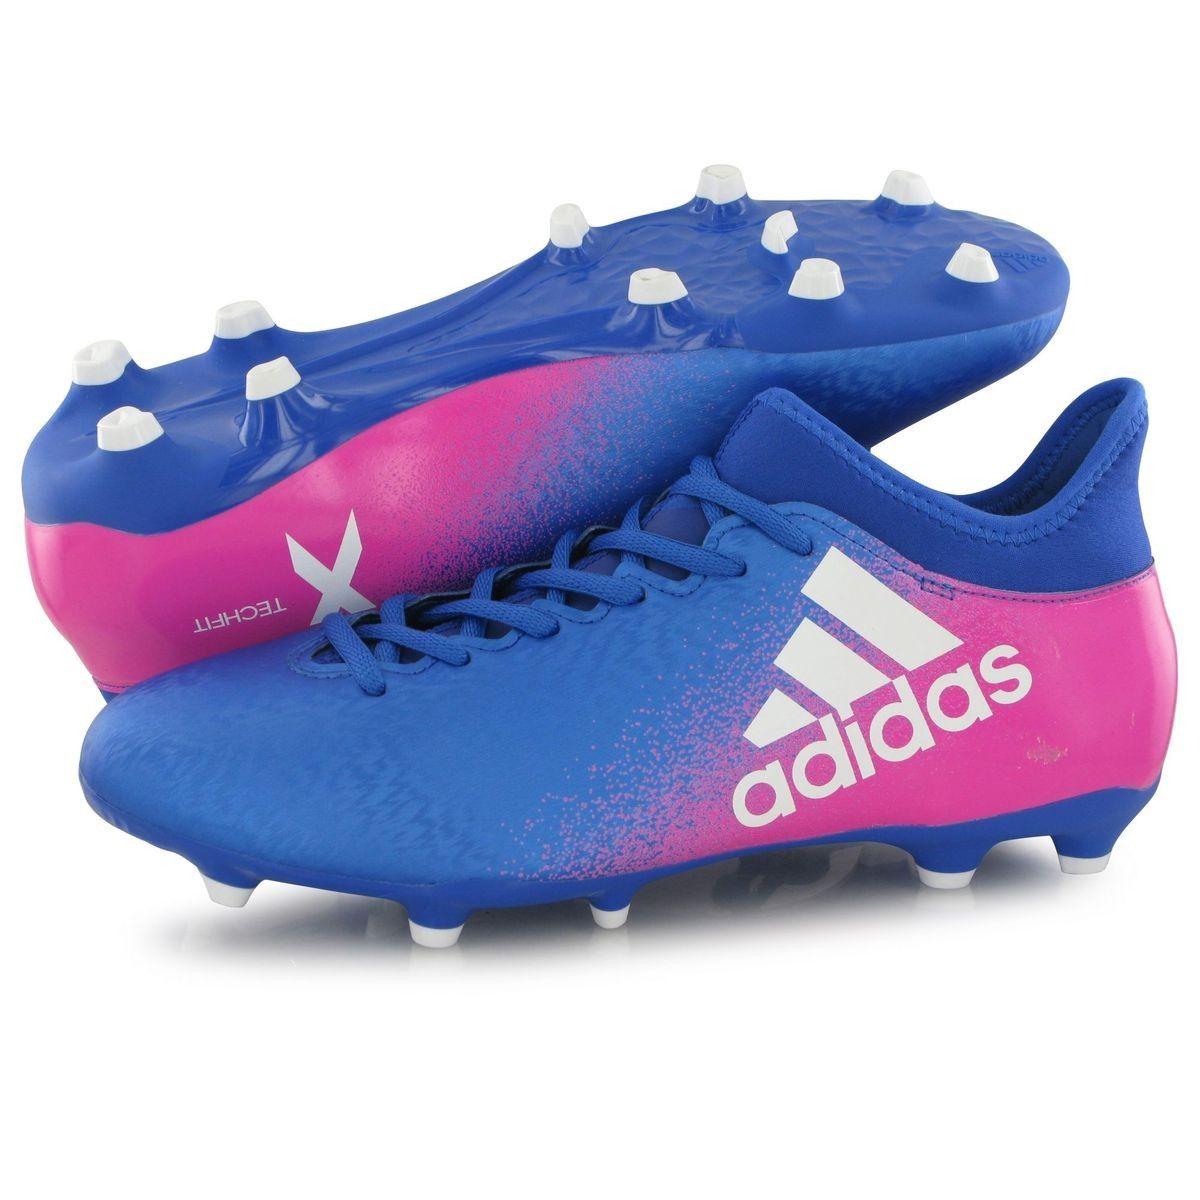 Chaussures Adidas X 16.3 Fg Bleu Homme - Taille : 46 | Chaussure ...